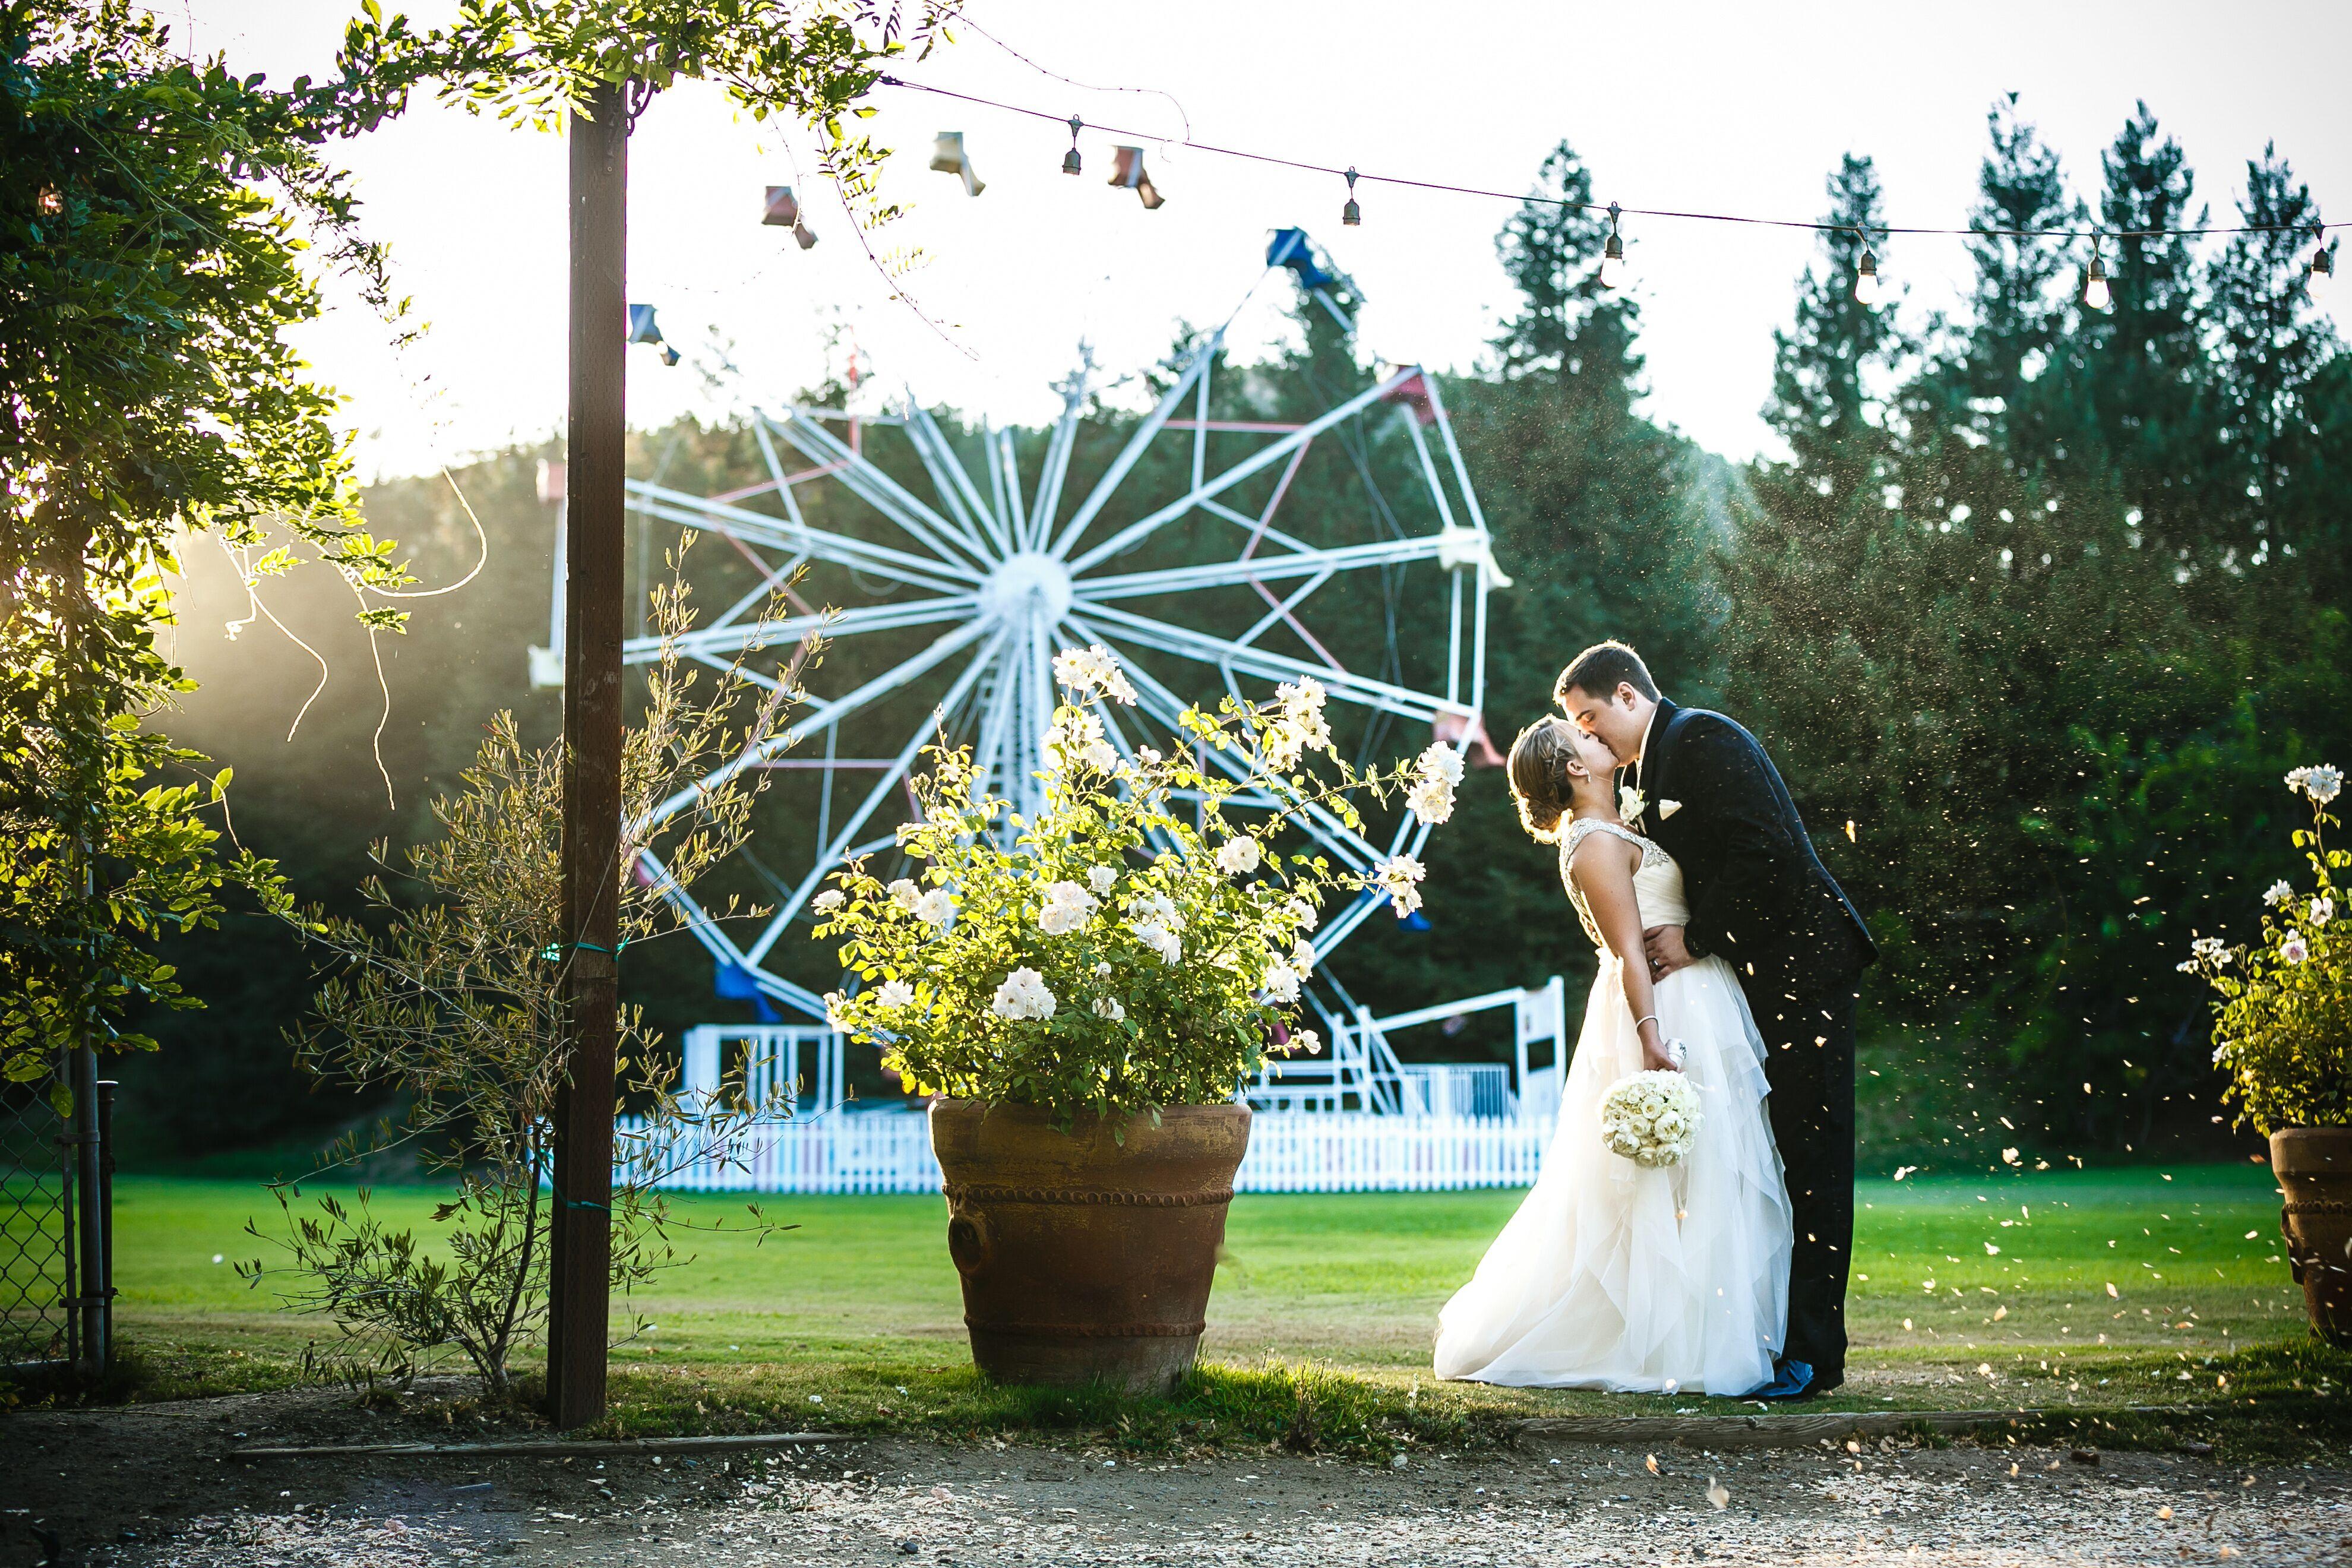 An Elegant Outdoor Wedding At Calamingos Ranch In Malibu